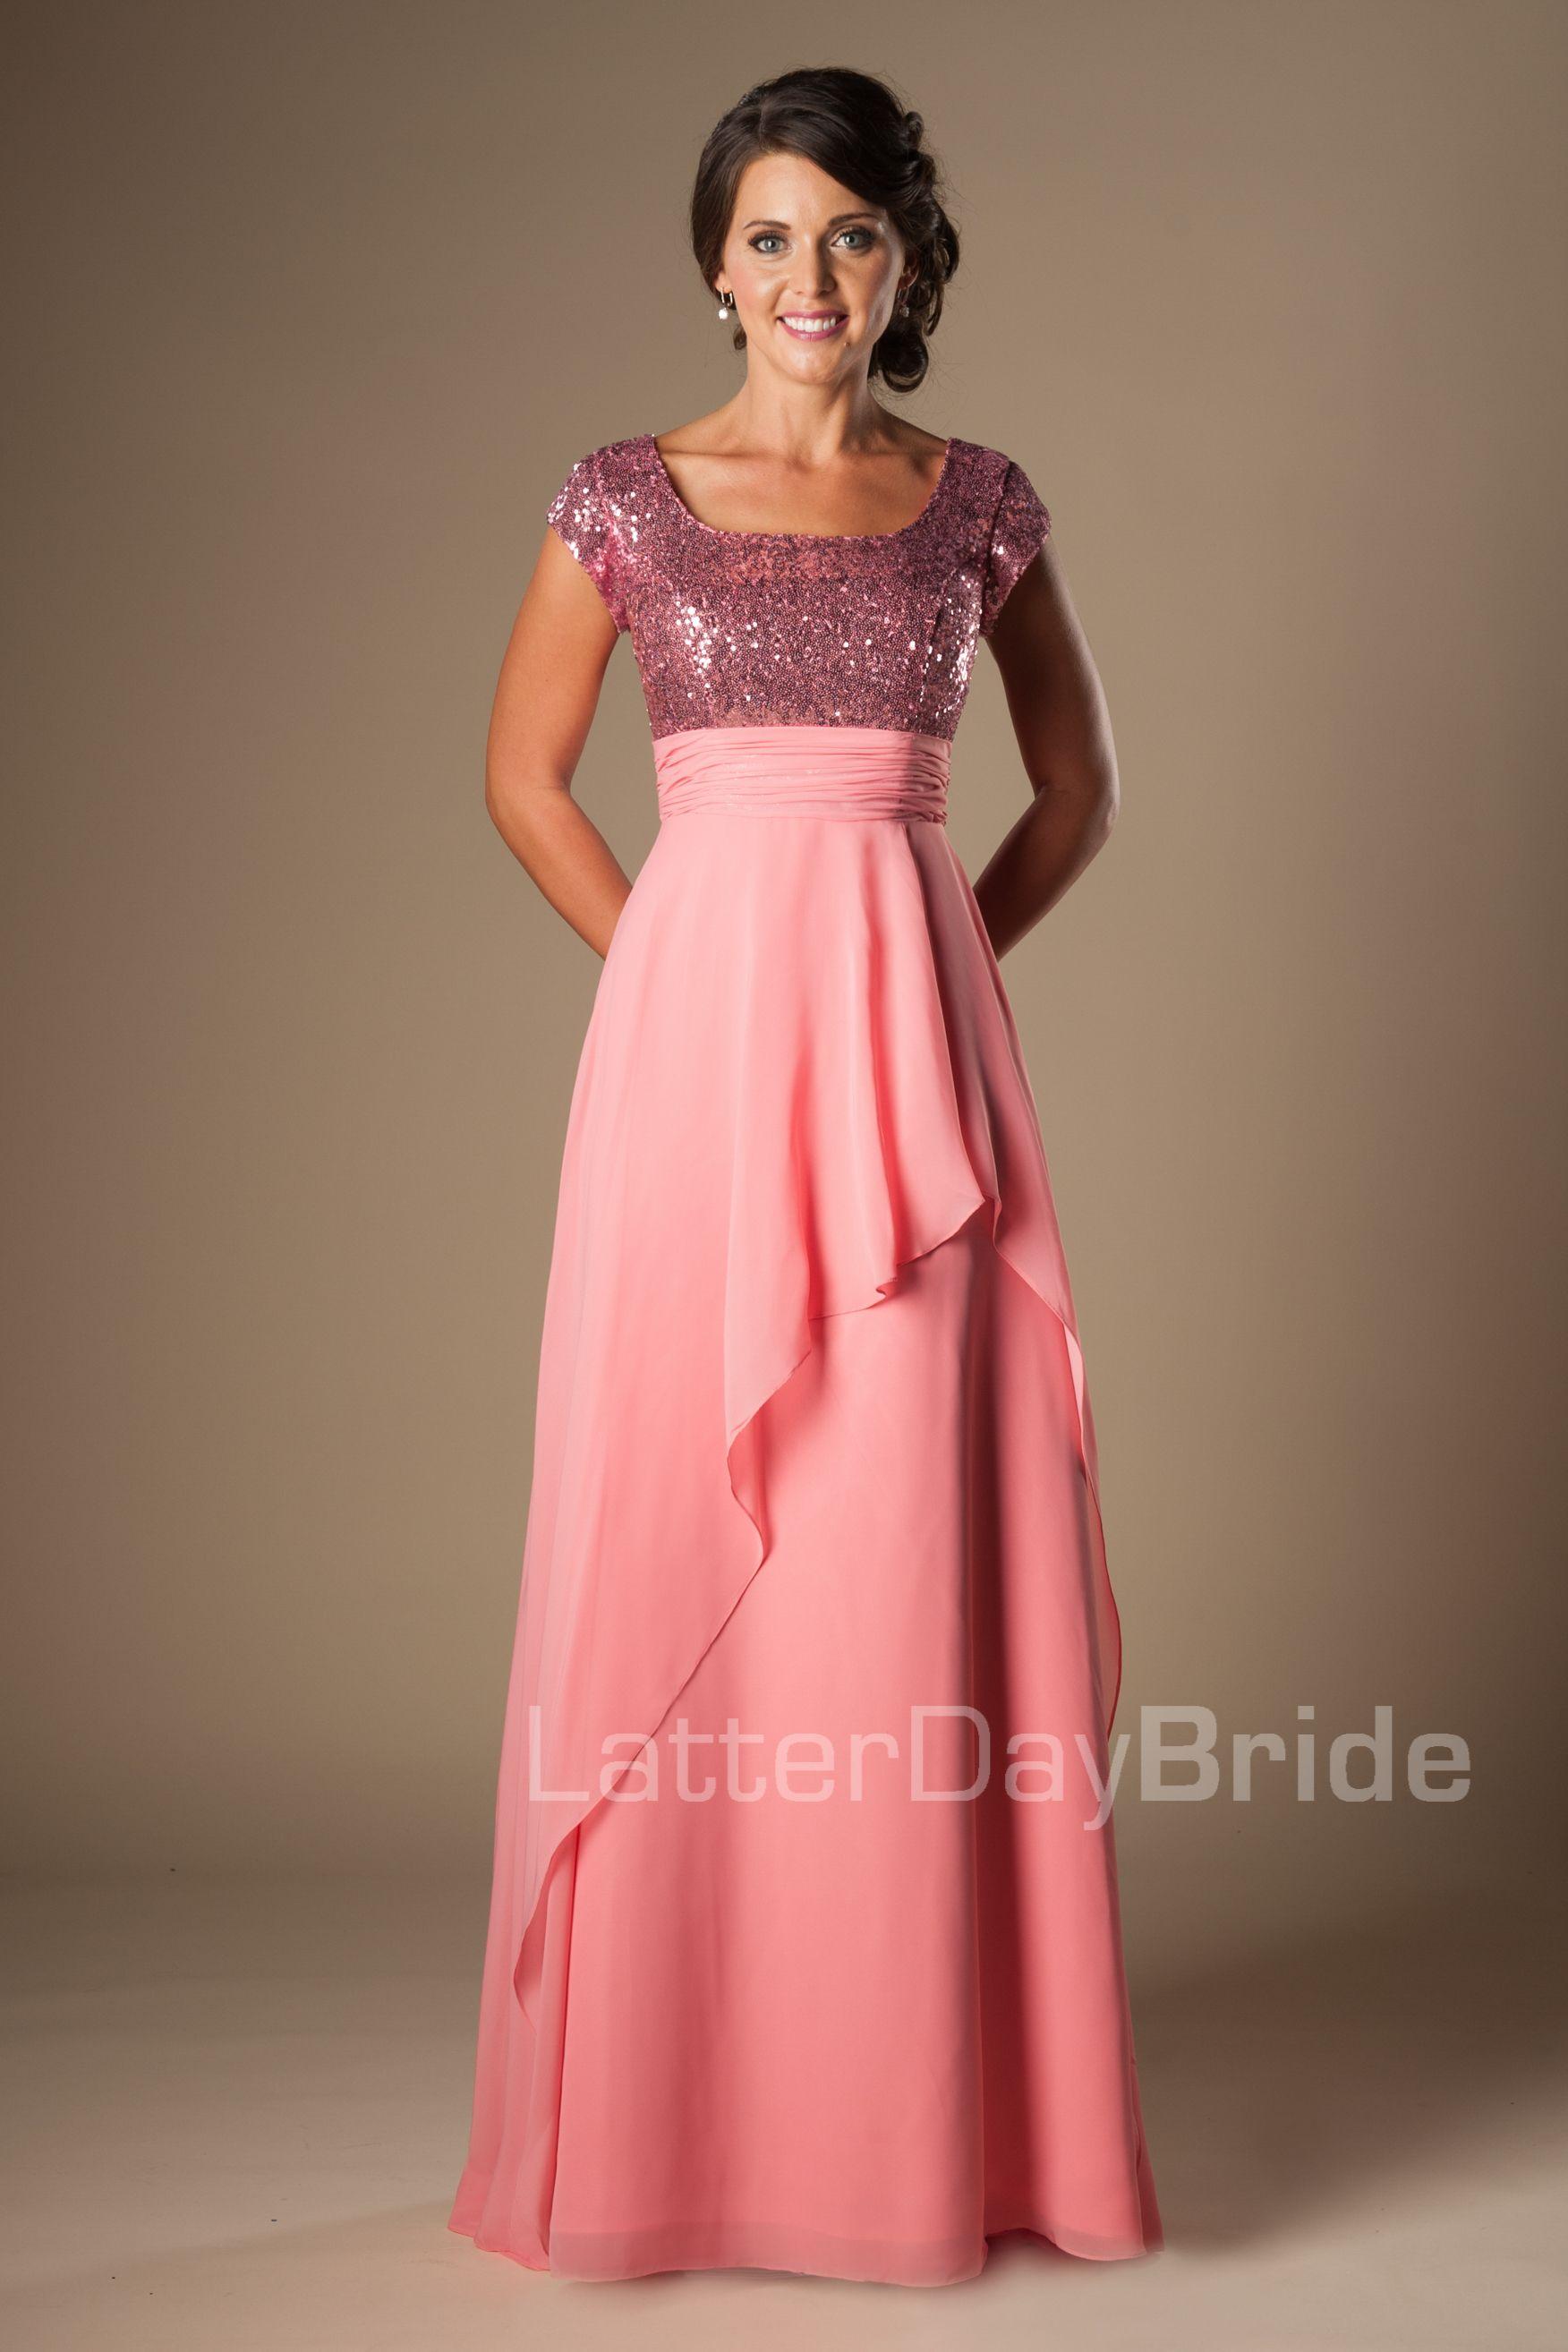 Pin de Brandy McManus en Modest Dresses | Pinterest | Vestiditos ...